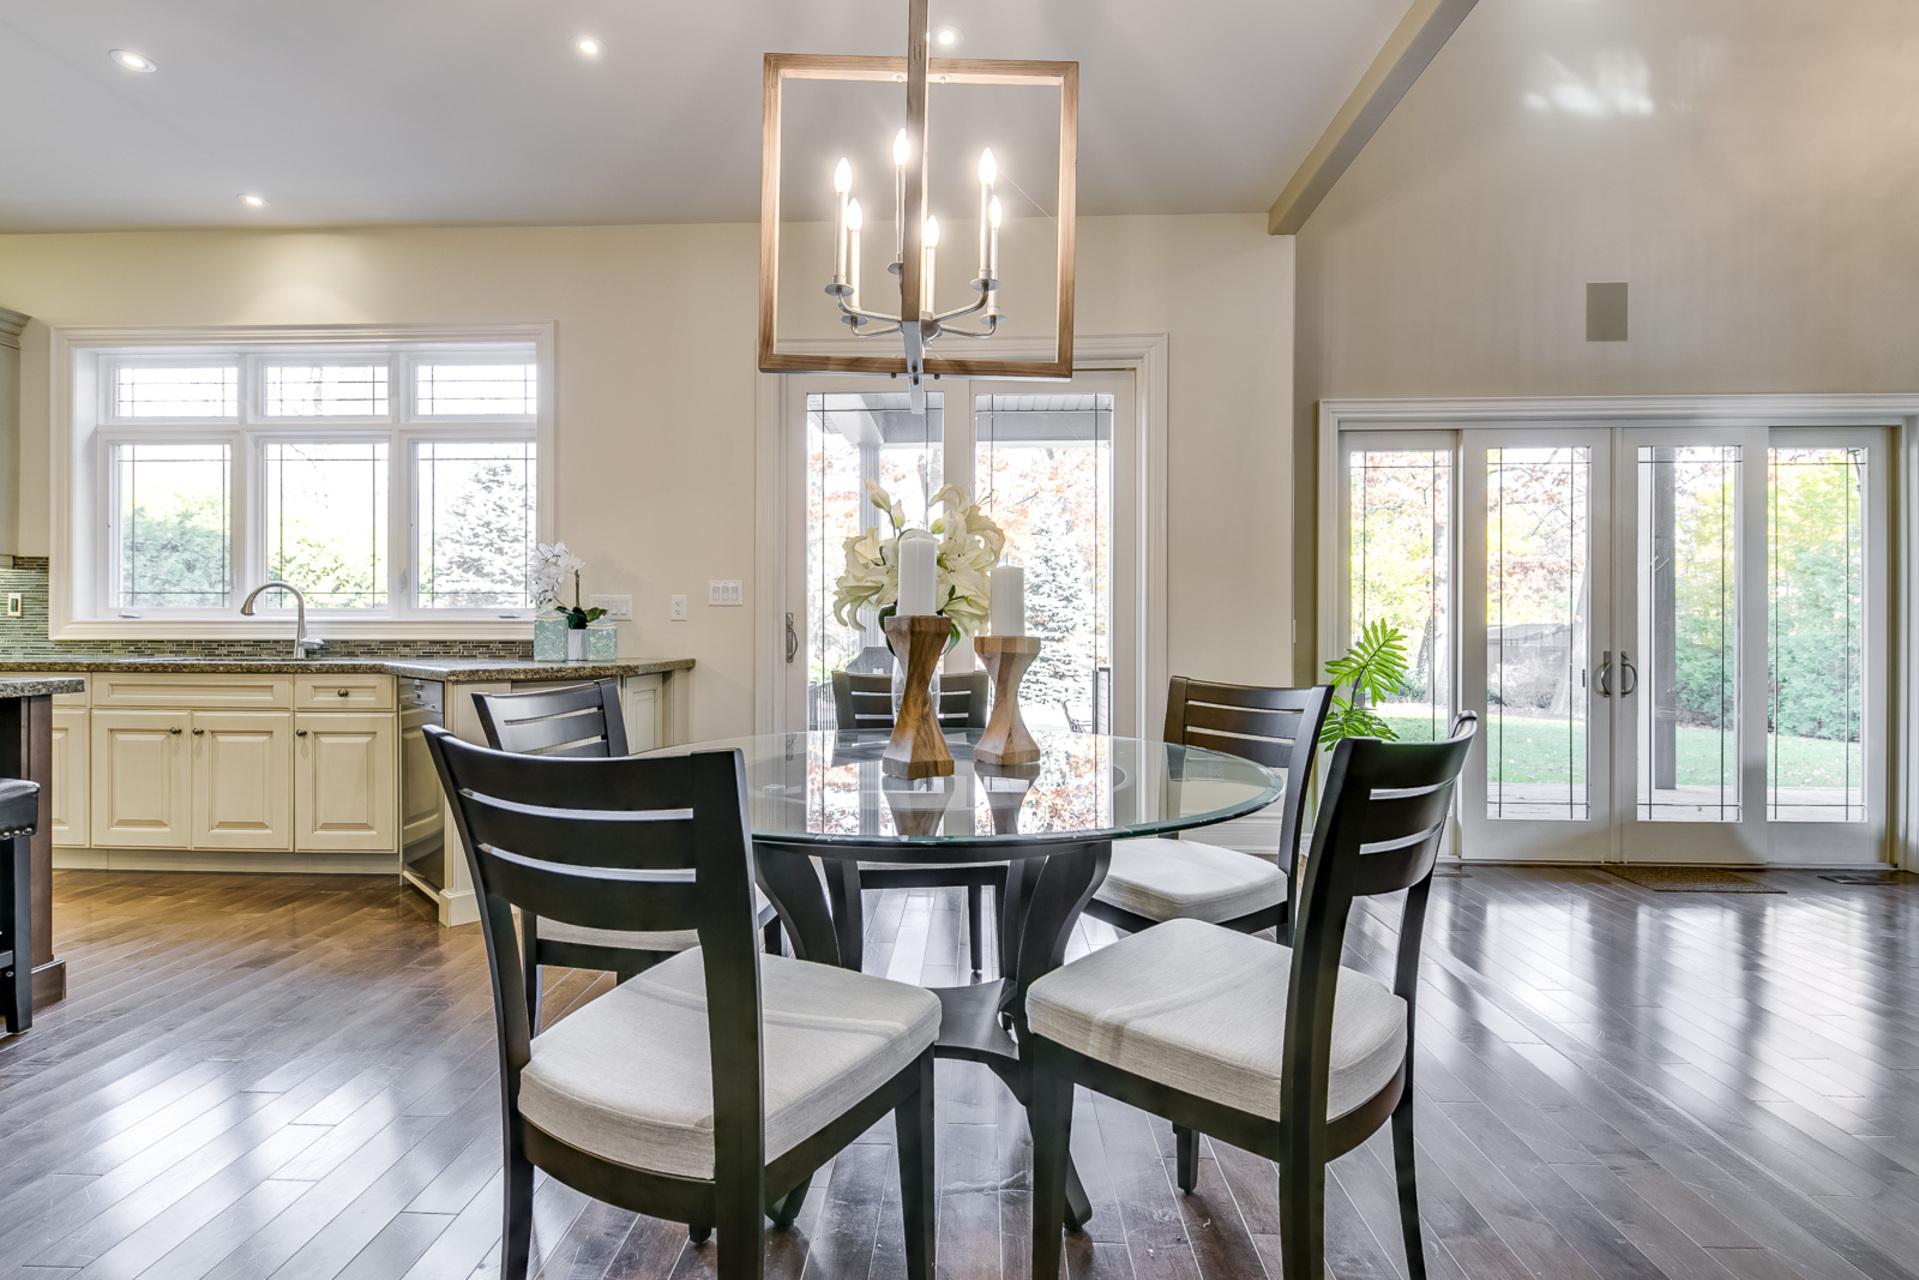 Breakfast Area - 5041 Lakeshore Rd, Burlington - Elite3 & Team at 5041 Lakeshore Road, Appleby, Burlington